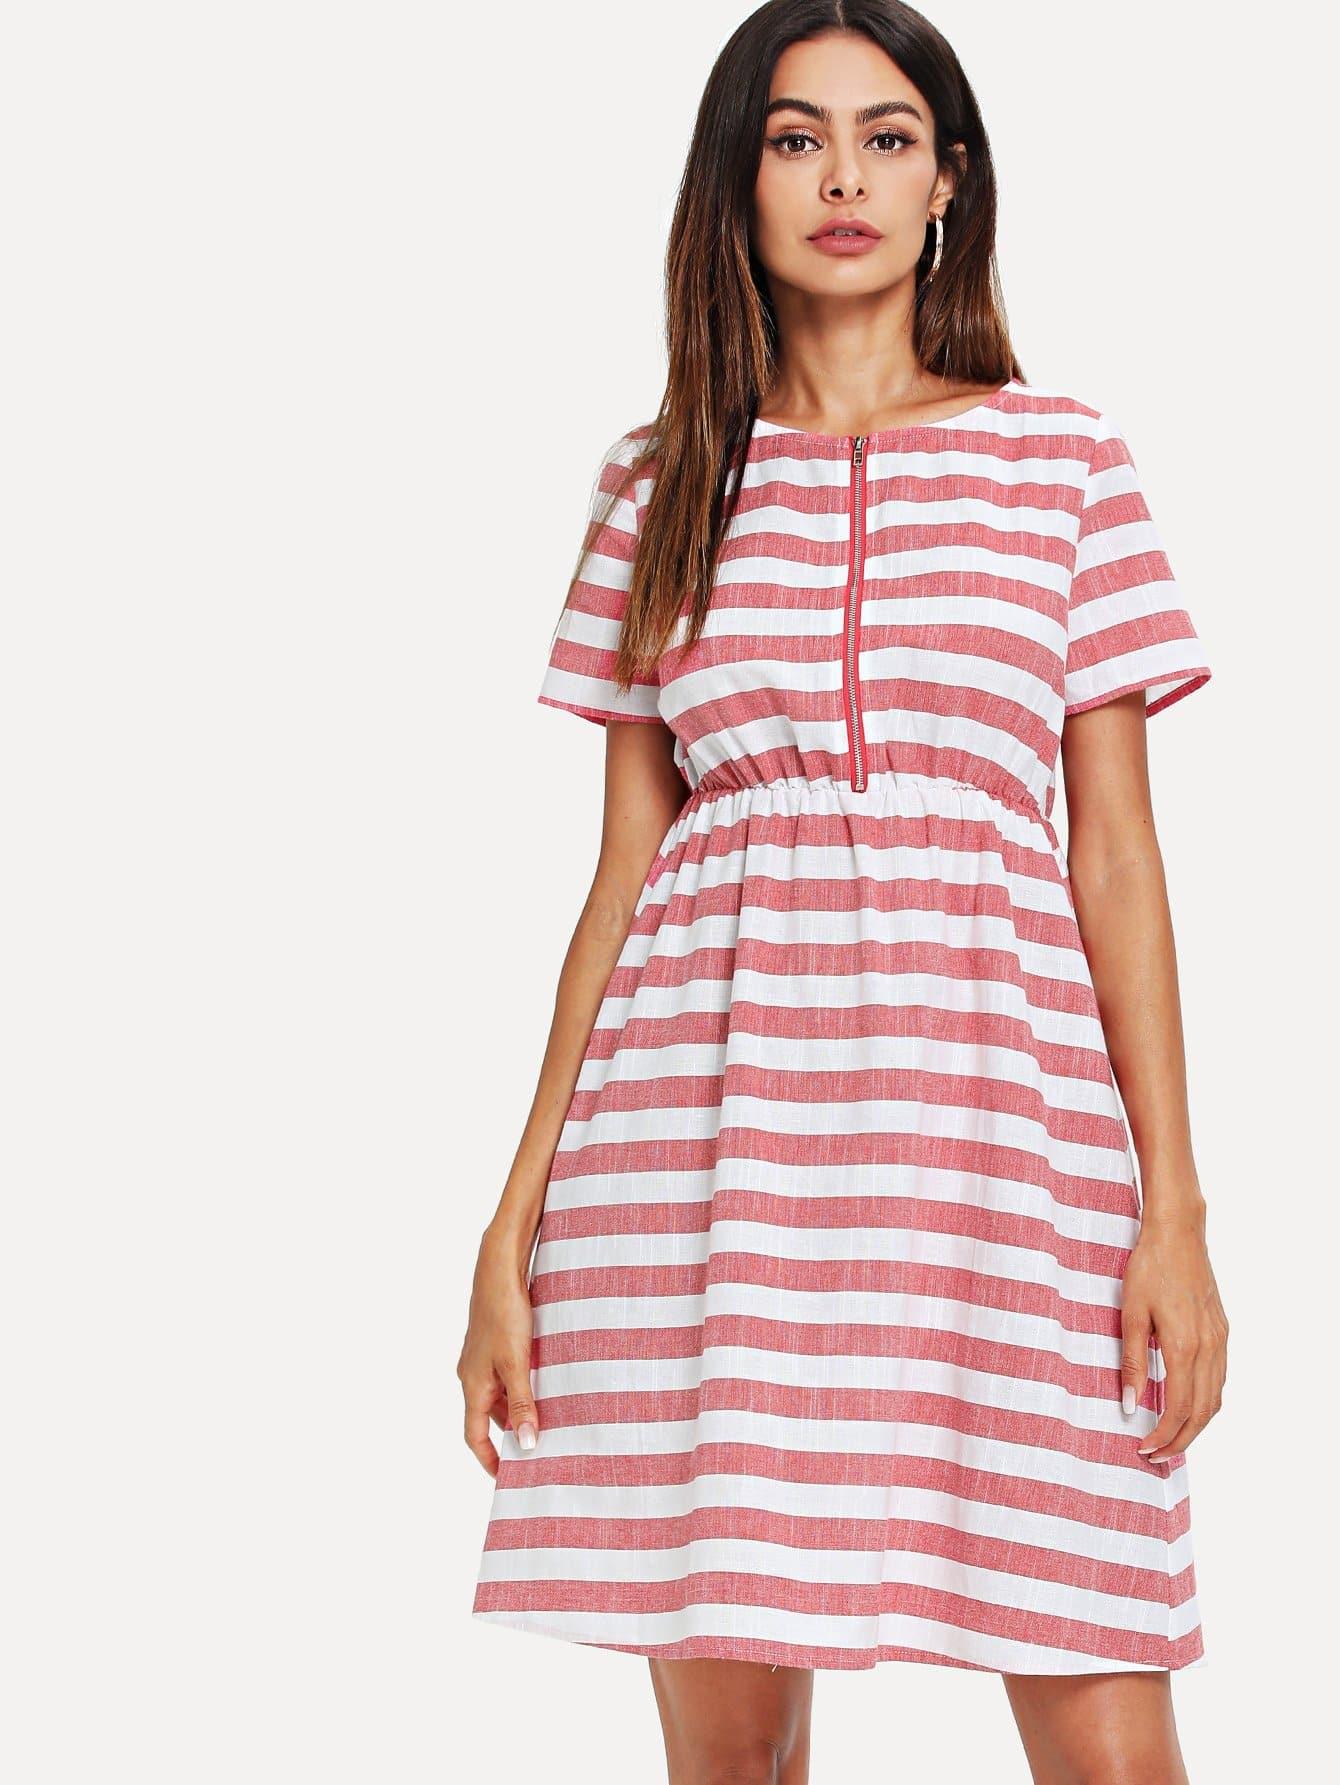 Zip Half Placket Elastic Waist Striped Dress half placket striped smock shirt dress